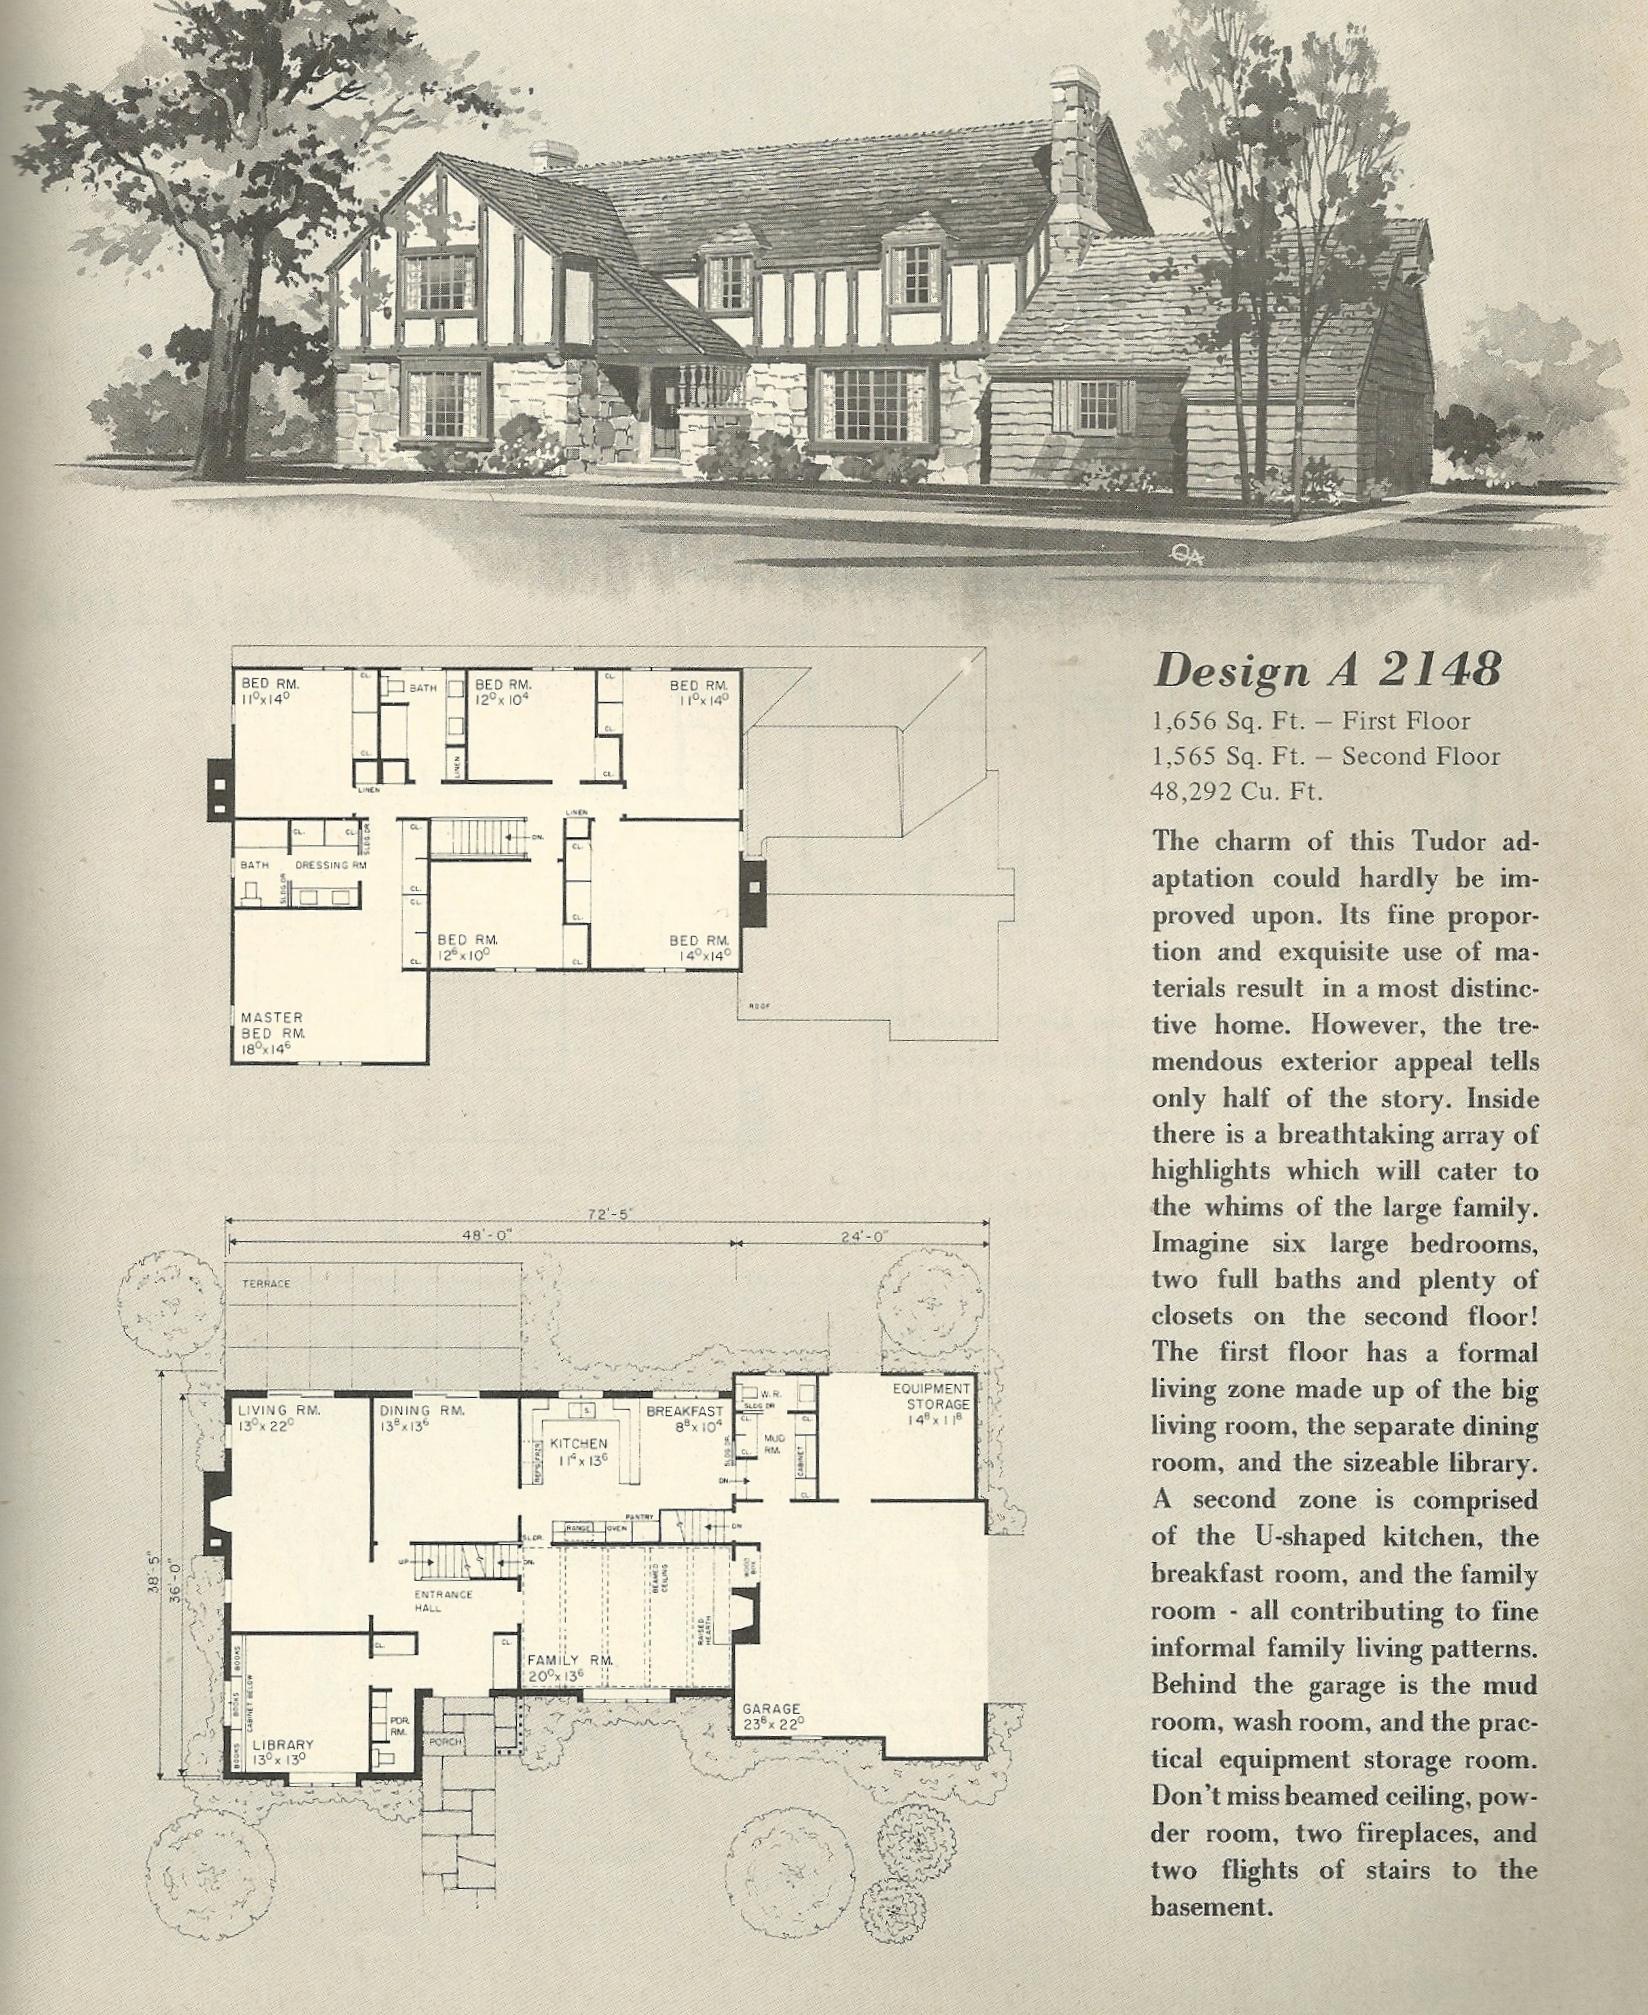 Vintage house plans 2148 antique alter ego for Antique house plans